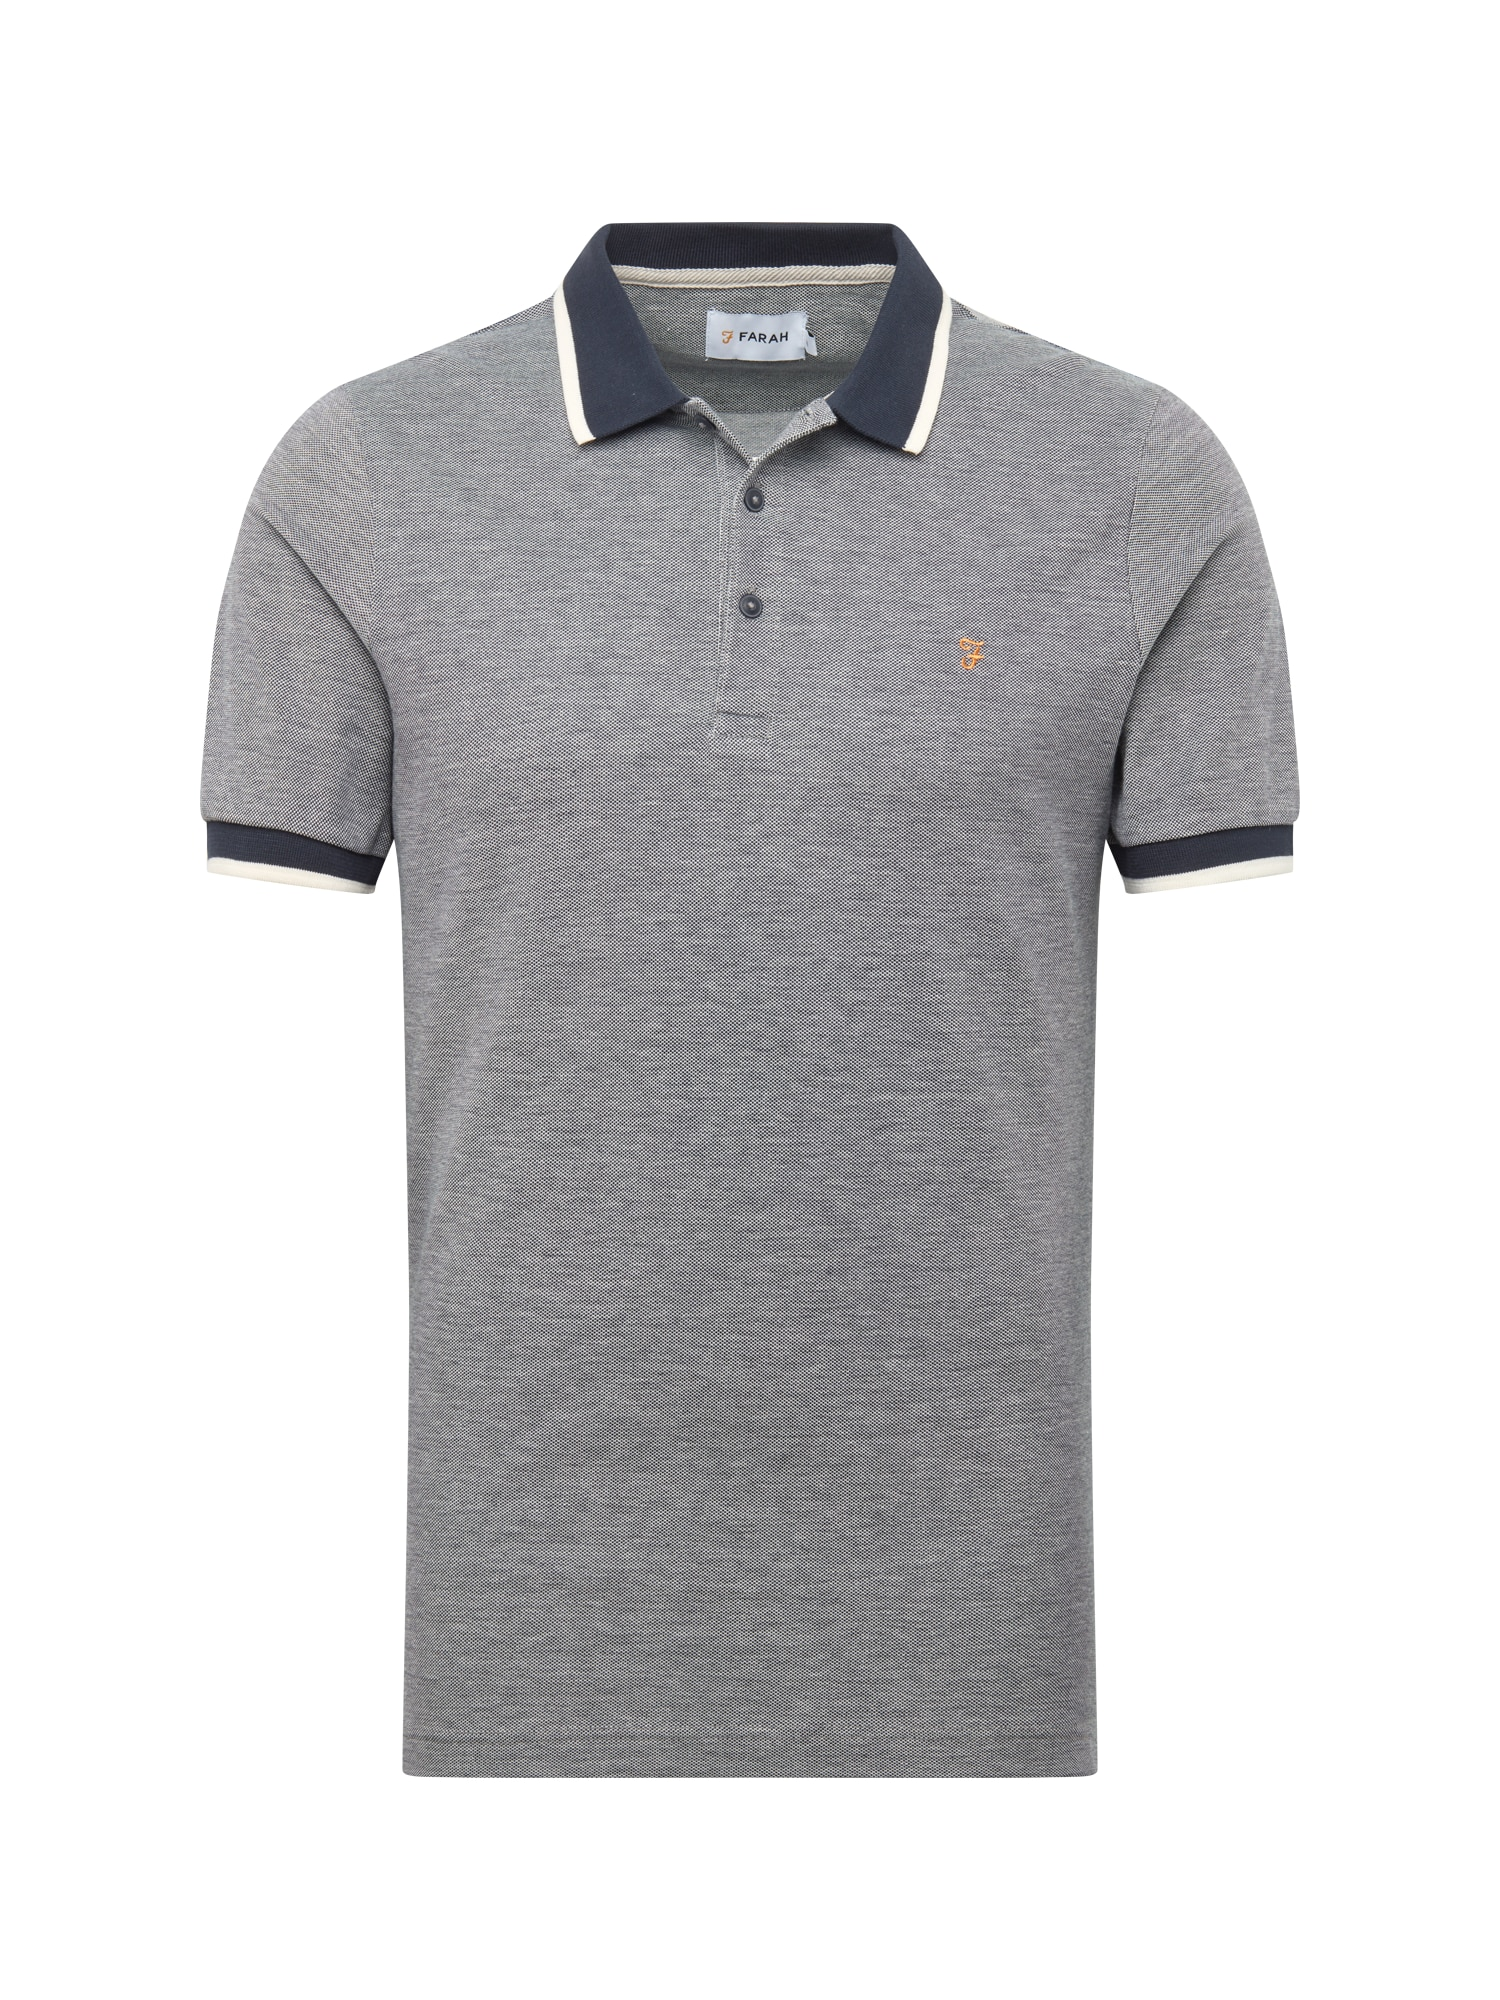 Tričko BASEL PIQUE námořnická modř šedá FARAH